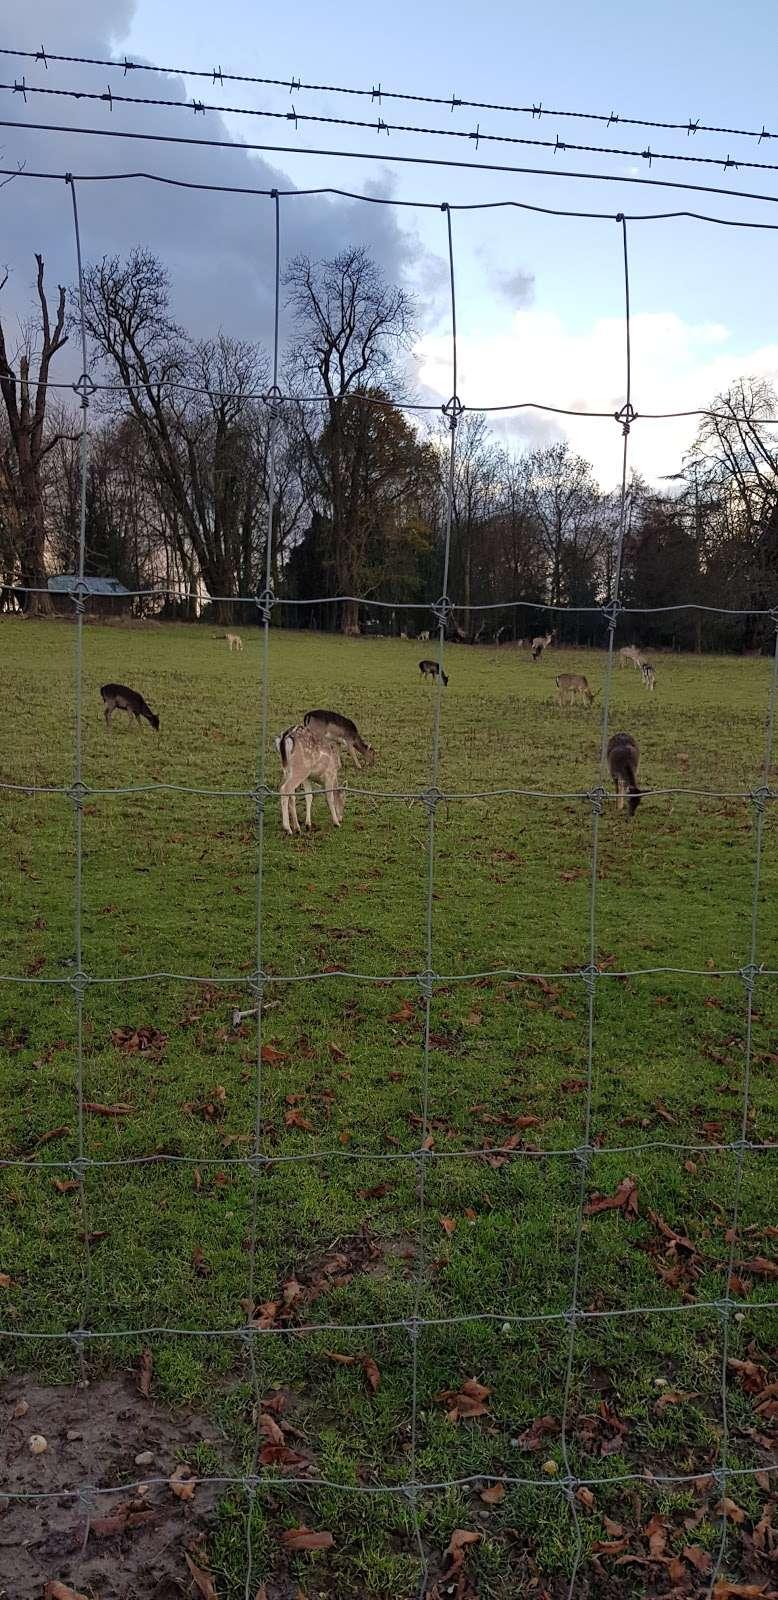 South Weald Deer Enclosure - zoo  | Photo 4 of 4 | Address: Brentwood CM14 5QS, UK